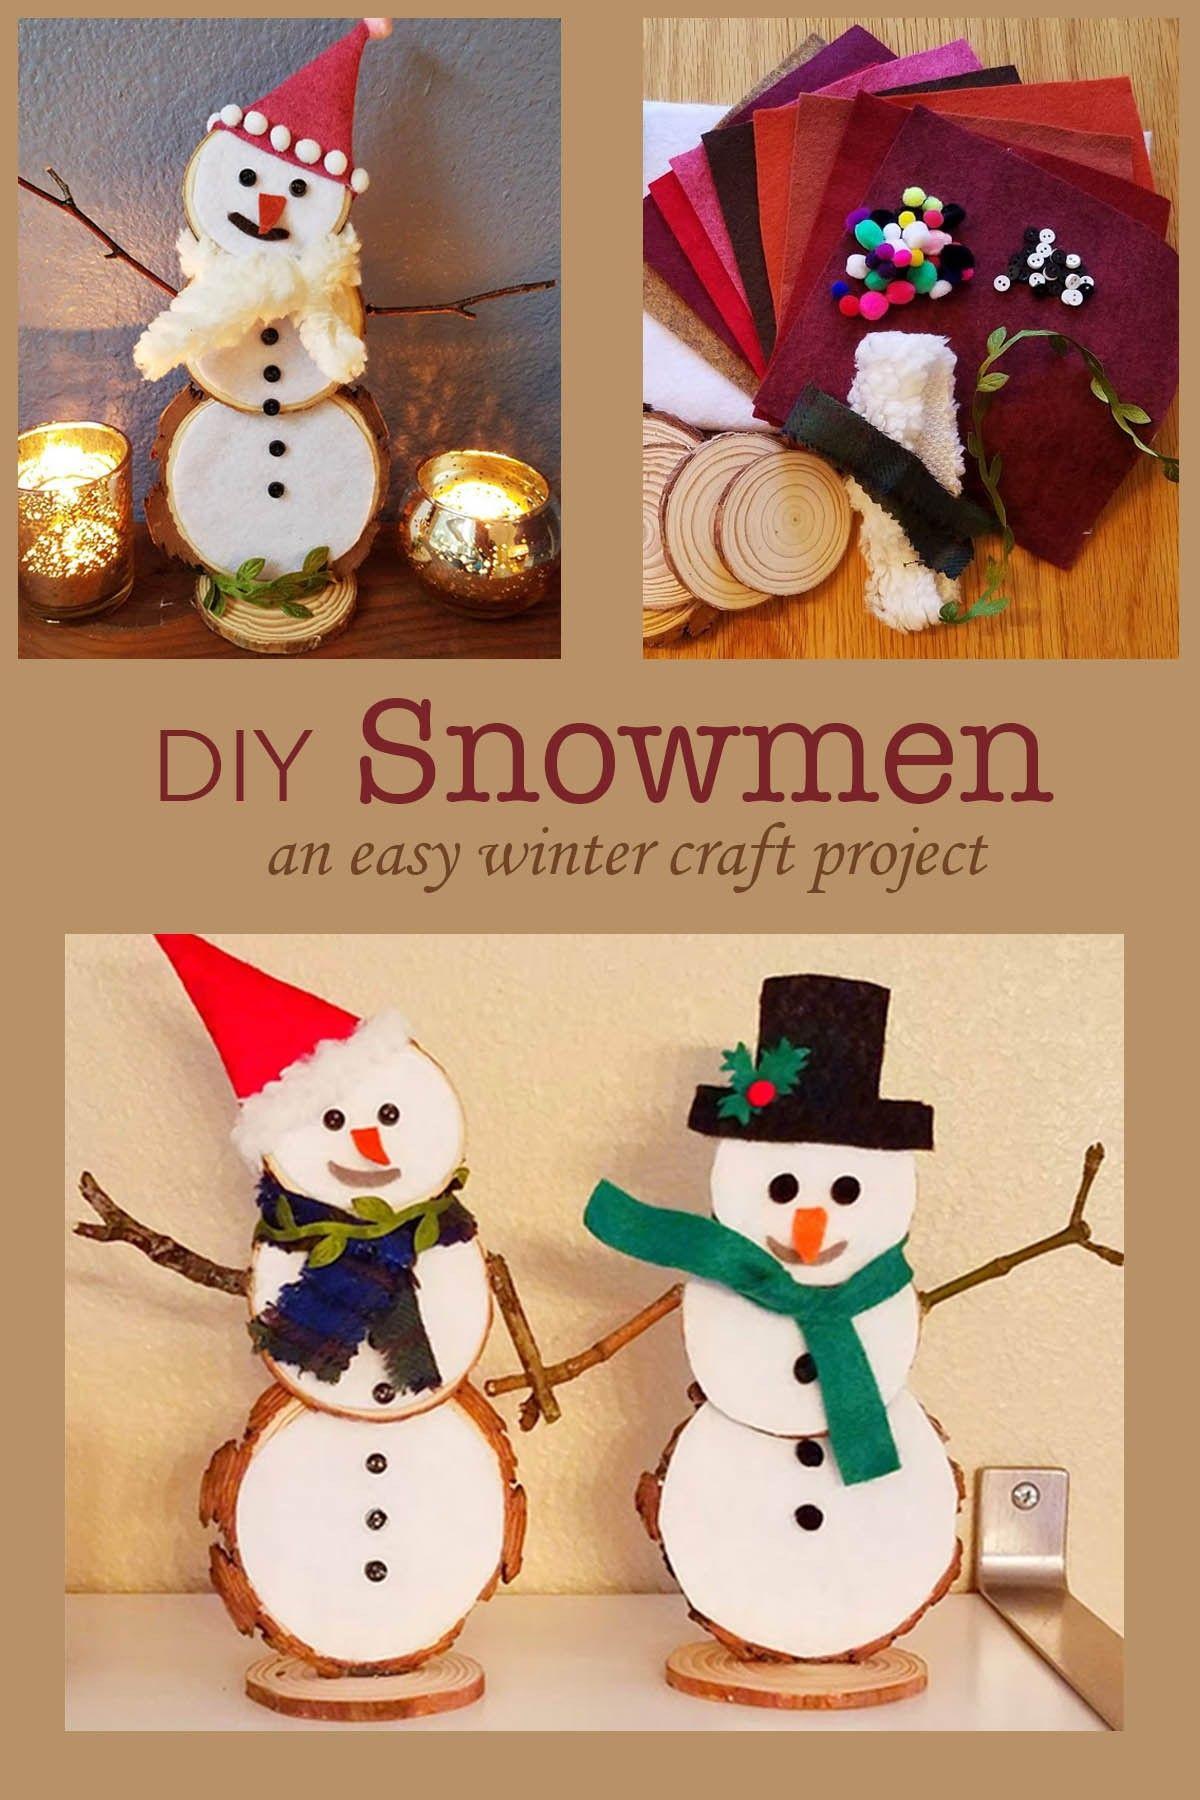 Diy Snowmen Decorations Diy Snowman Decorations Snowman Decorations Diy Snowman